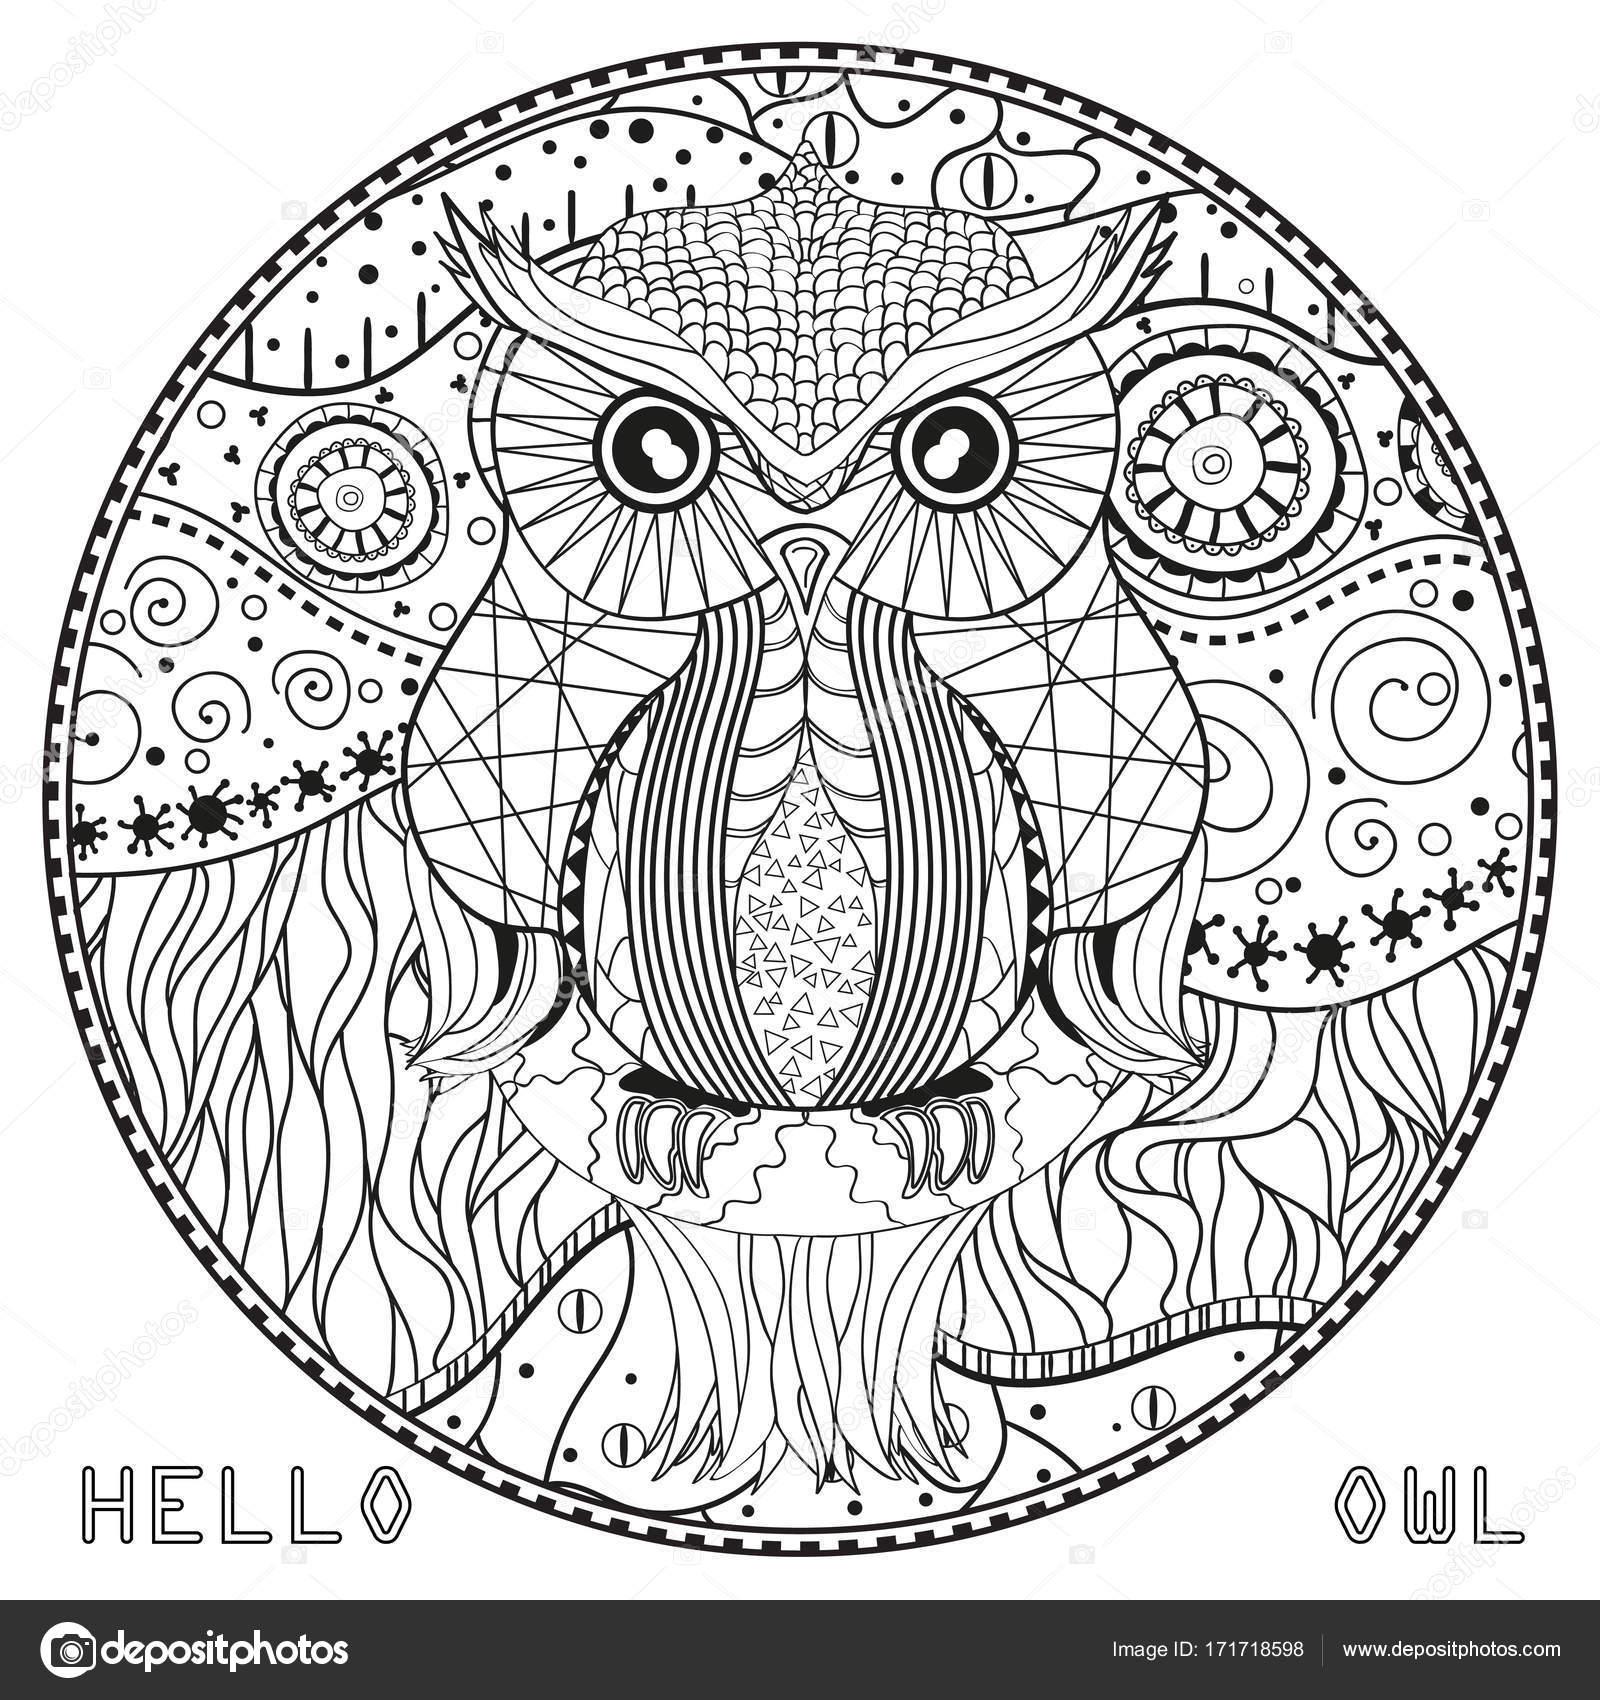 Kleurplaten Mandala Uil.Geniaal Mandala Kleurplaten Voor Volwassenen Uil Klupaats